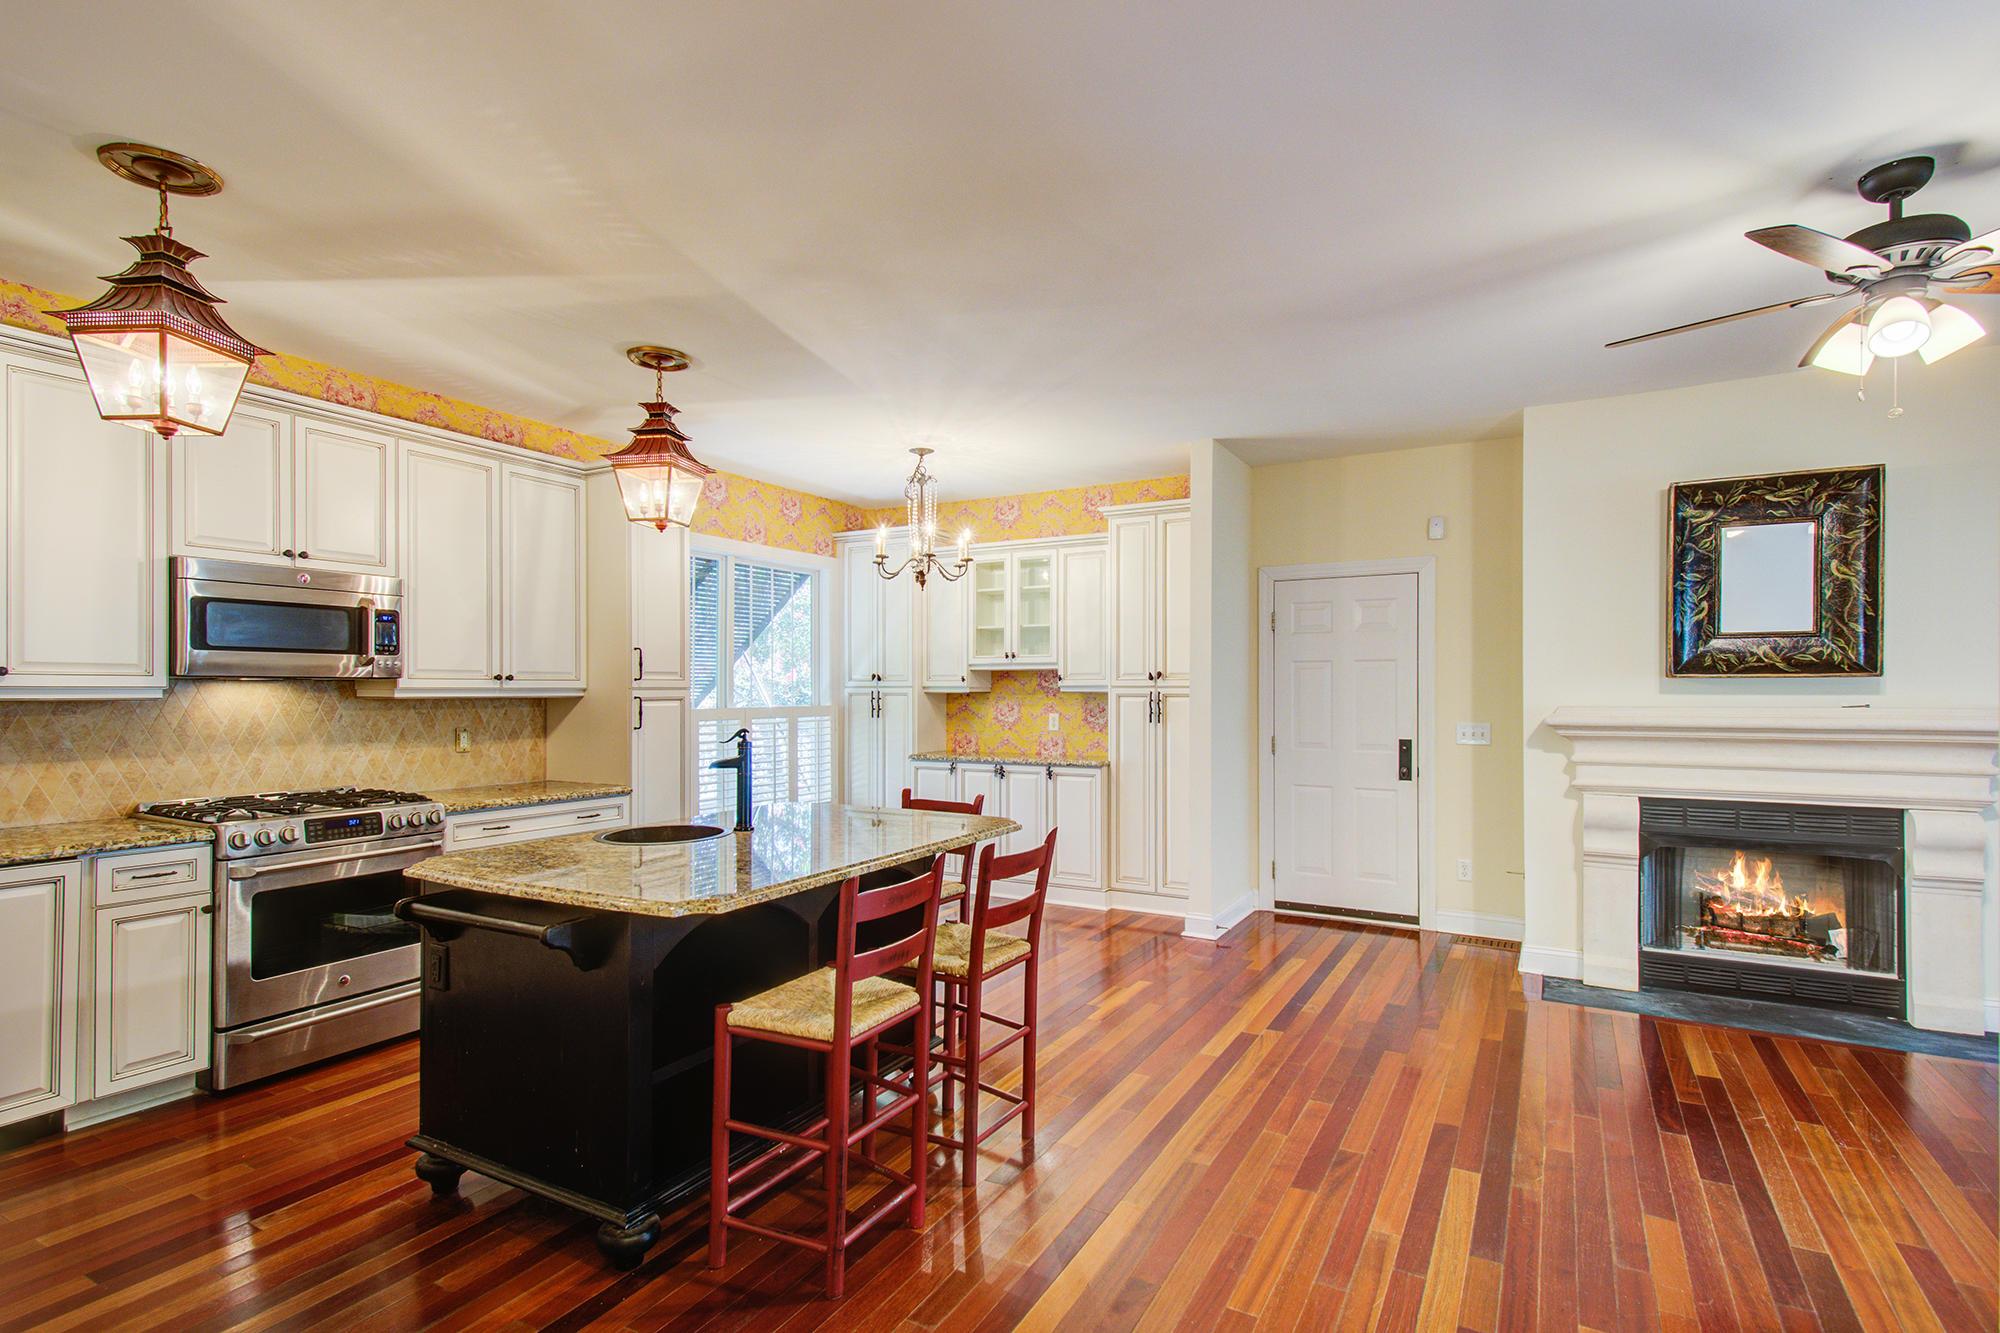 Center Park Homes For Sale - 950 Crossing, Daniel Island, SC - 59